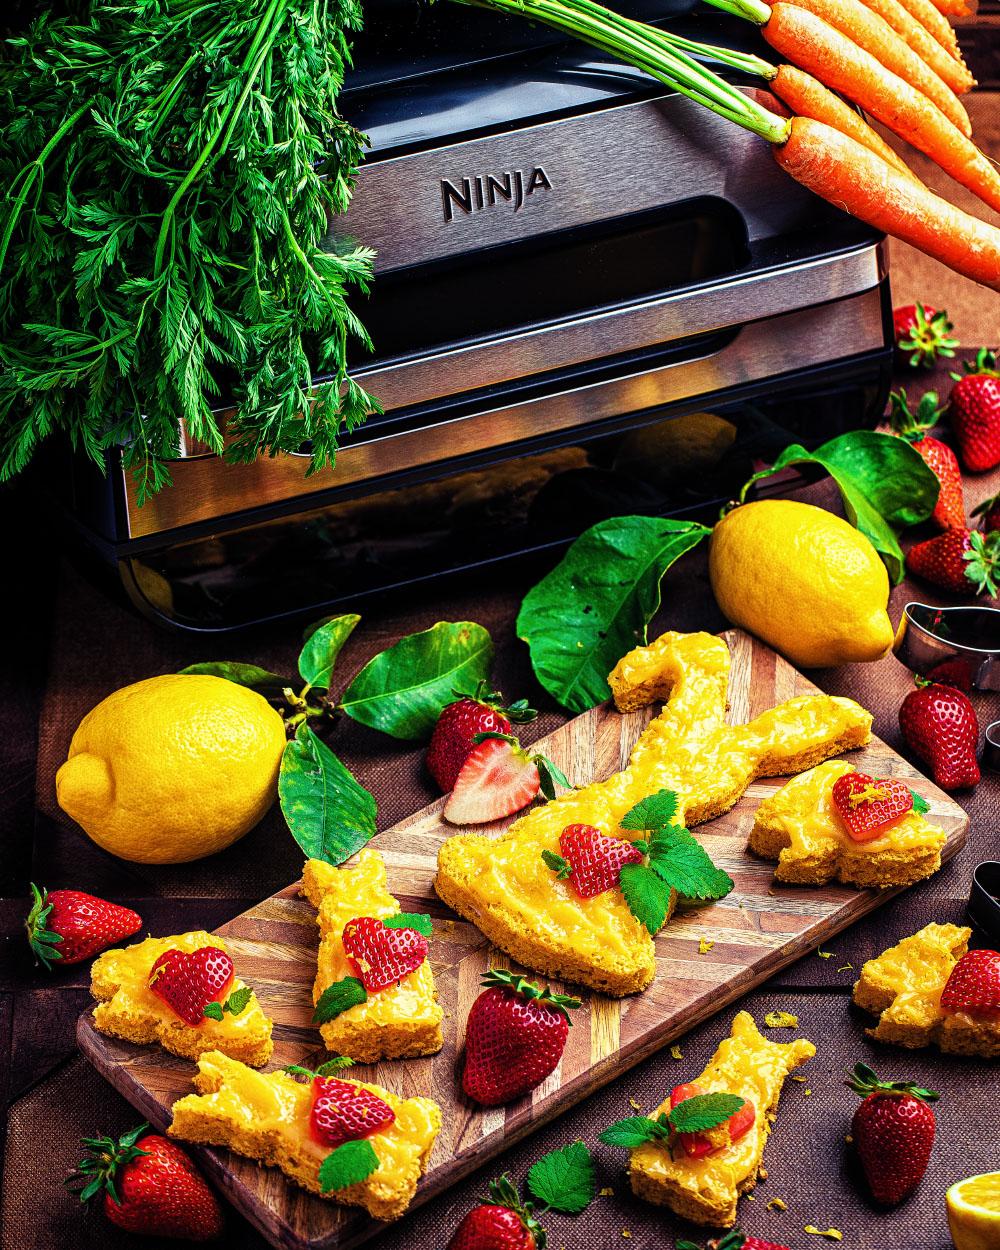 Möhren-Zitronen Häschen - gebacken in Heissluft Fritteuse - Ninja Foodi Max